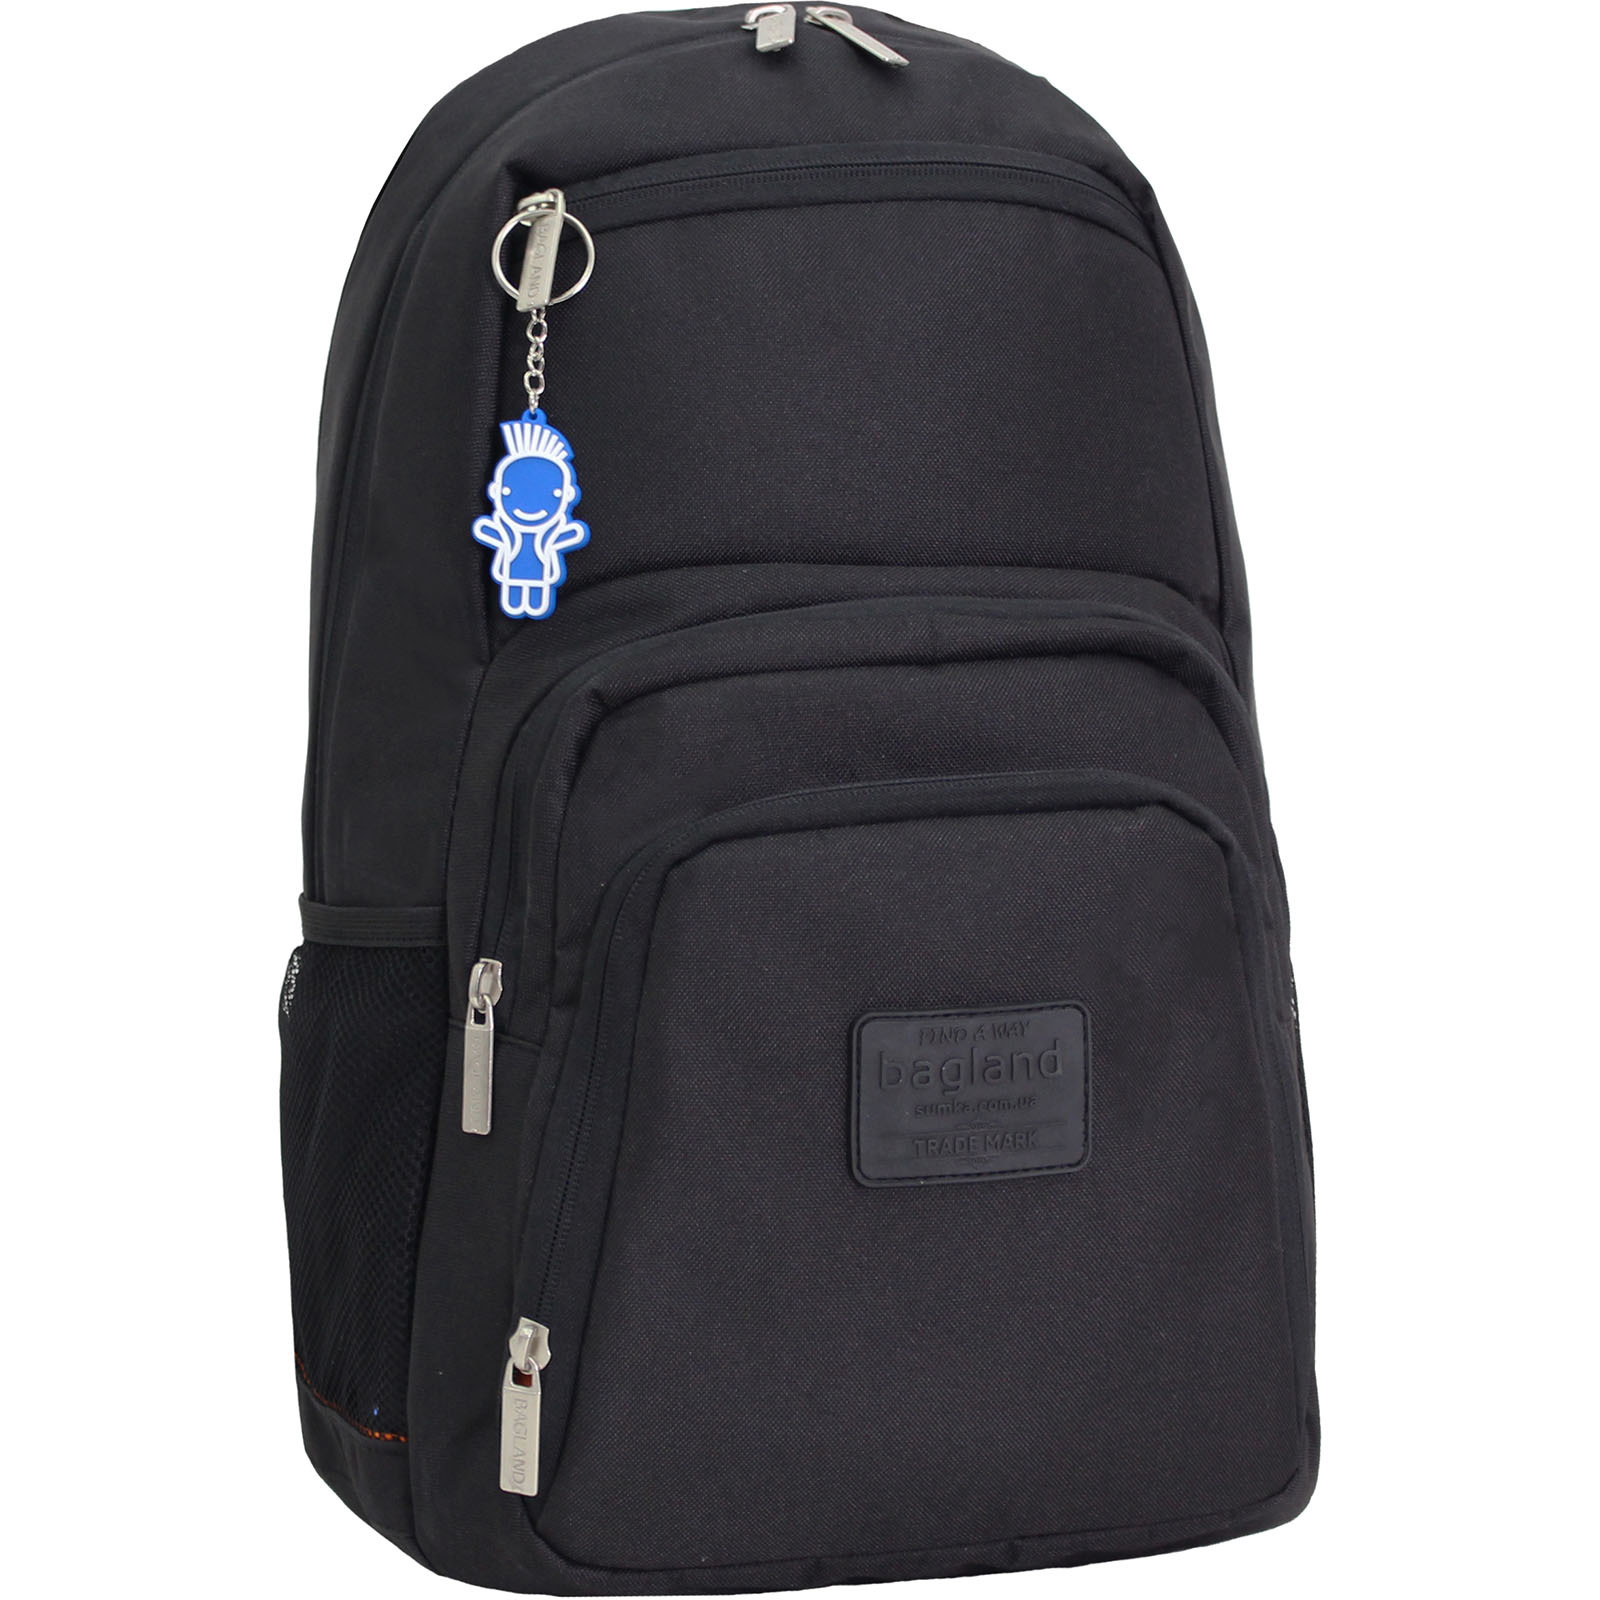 Рюкзаки для ноутбука Рюкзак для ноутбука Bagland Freestyle 21 л. Чёрный (0011966) IMG_0555.JPG